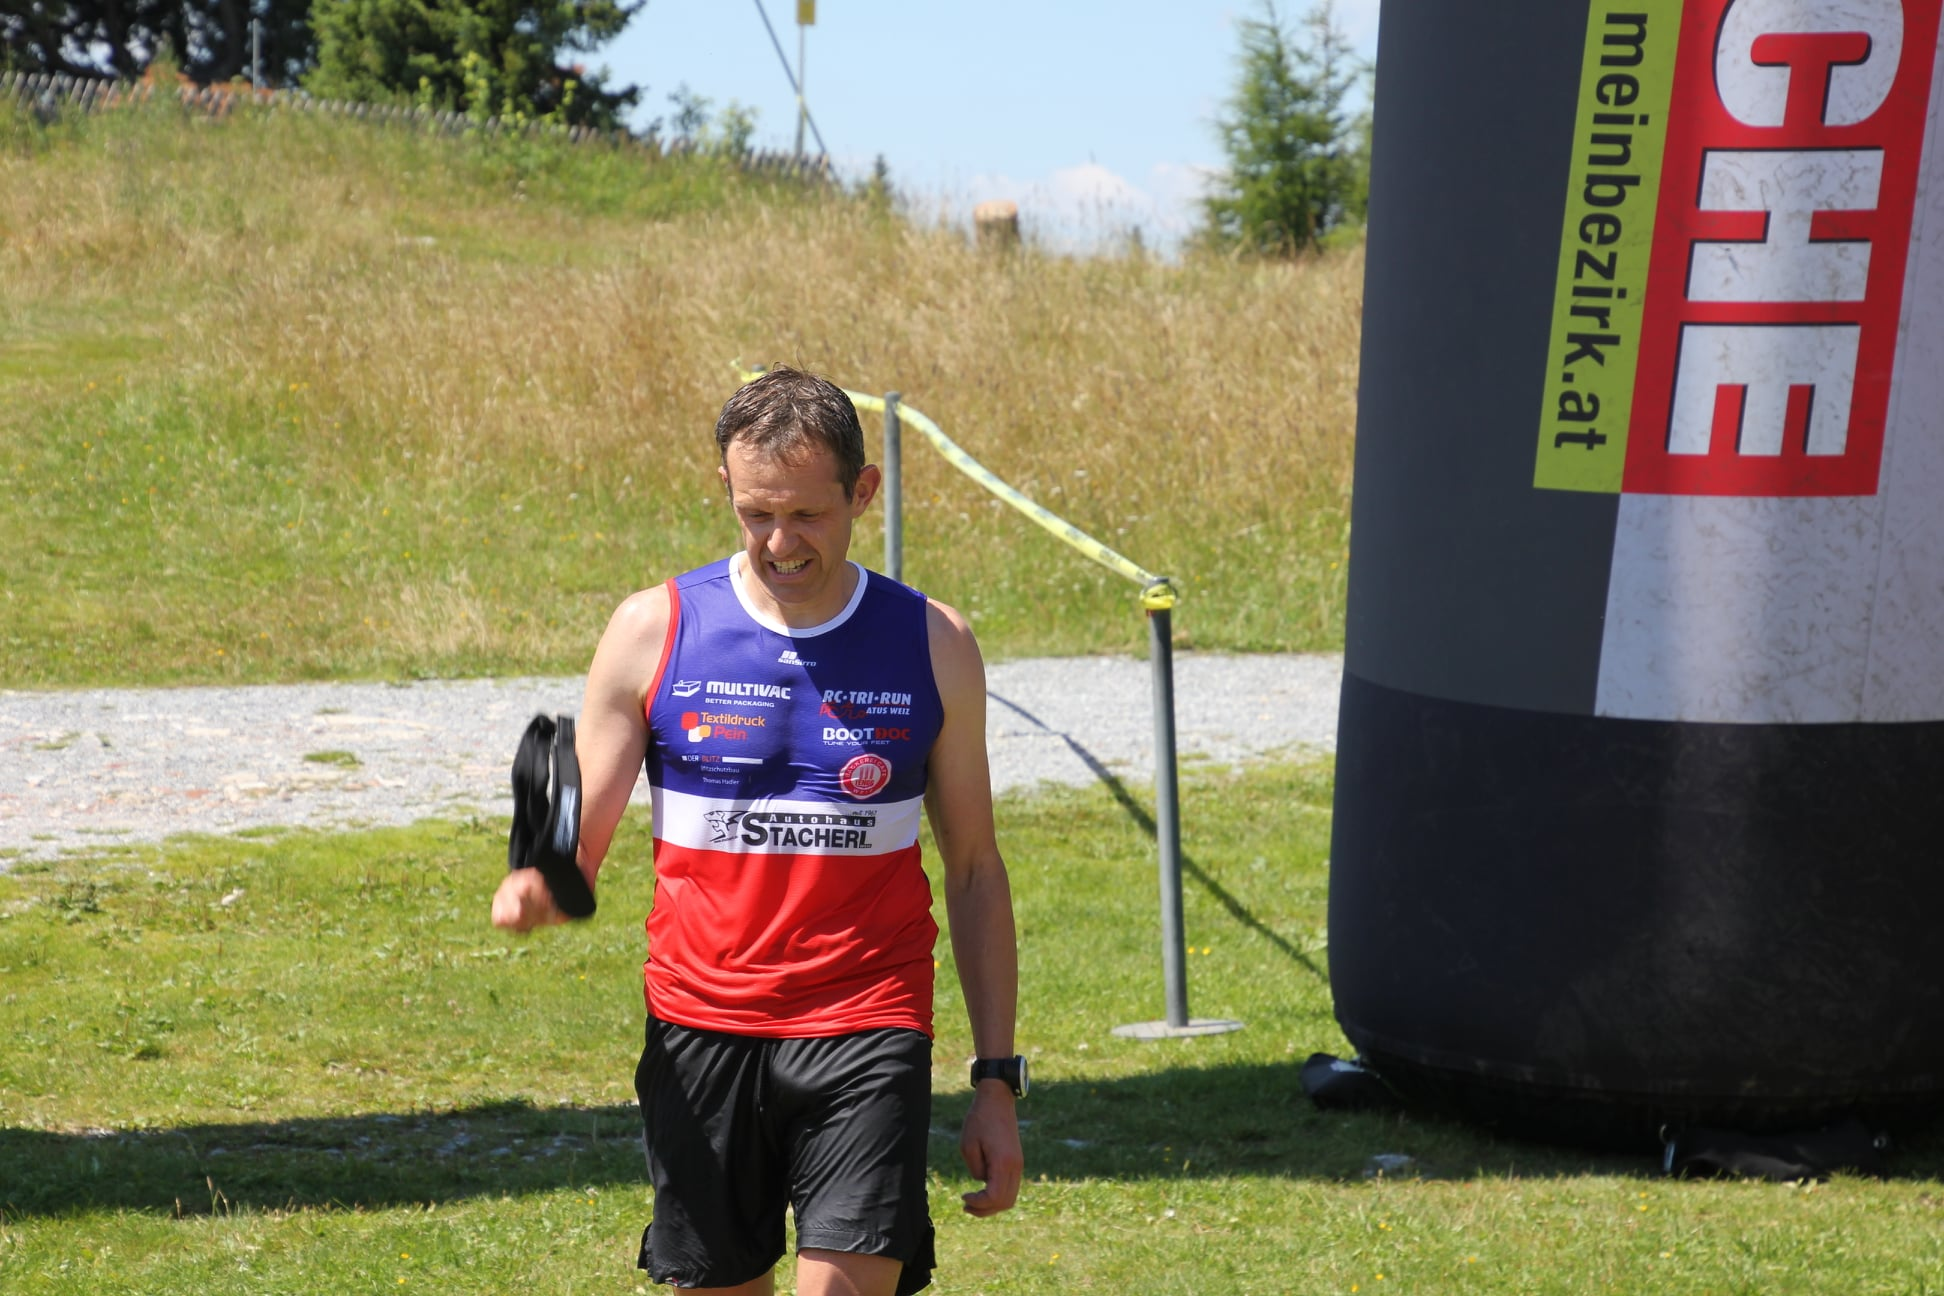 Laufen -rtr-weiz-116584851_3809010289126743_5610459167342310718_o-Schöcklplateau-Marathon 2020